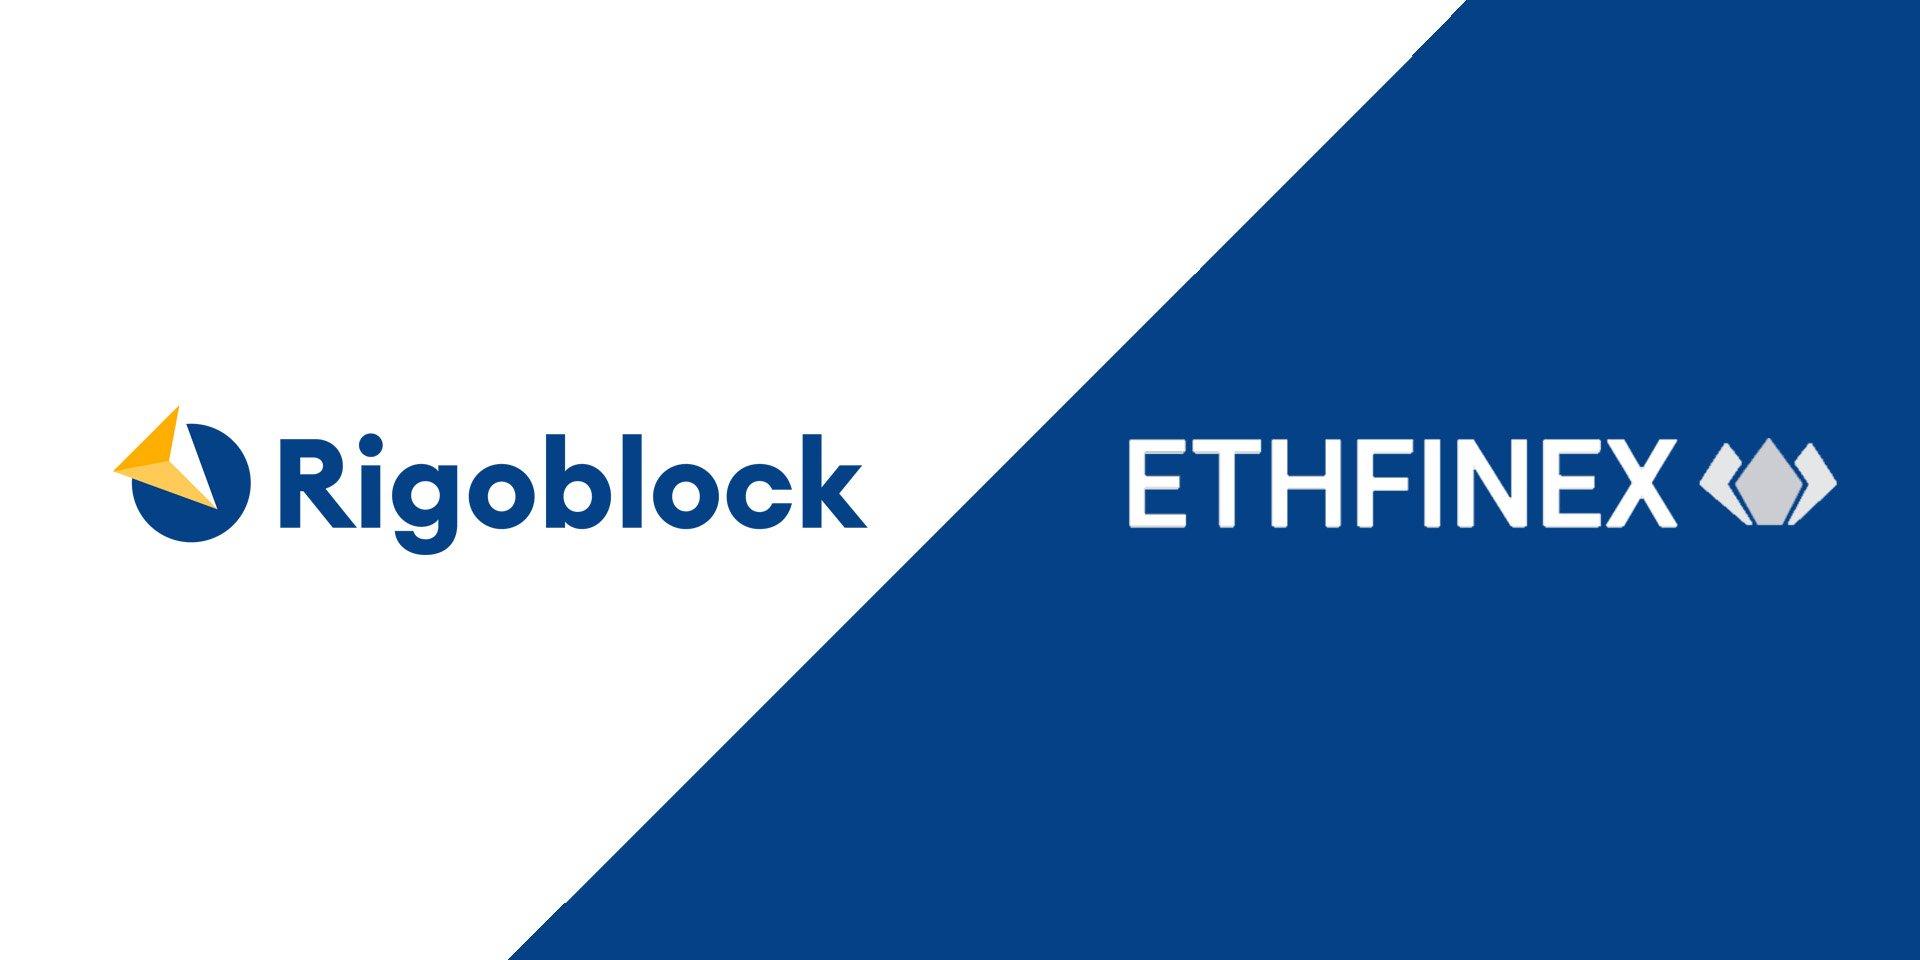 Asset Management Network RigoBlock Announces Ethfinex Partnership